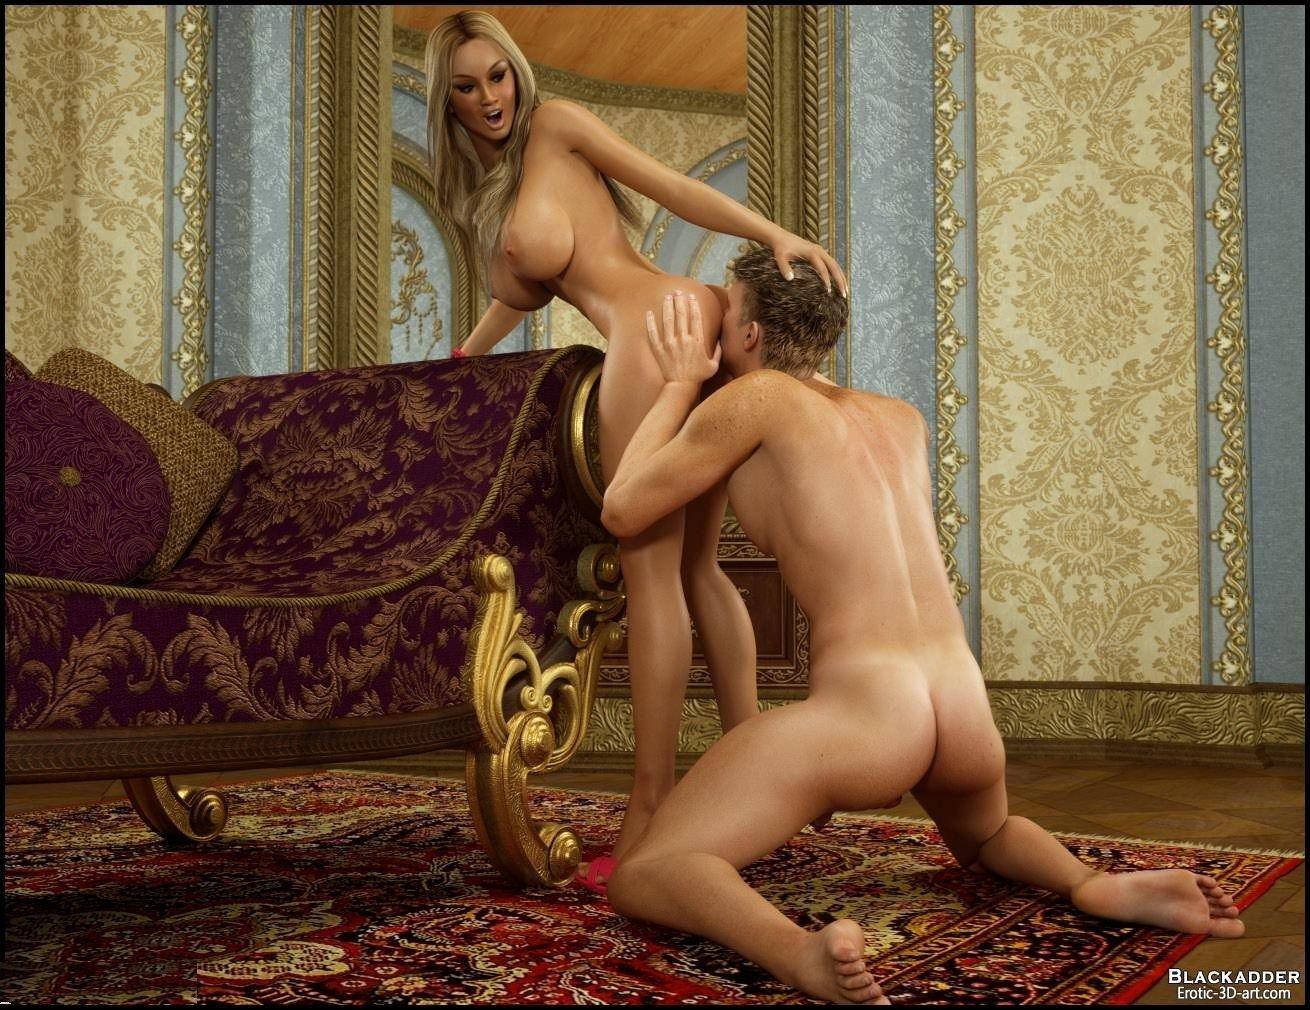 заметил, царский секс качественный голая пьяная спит